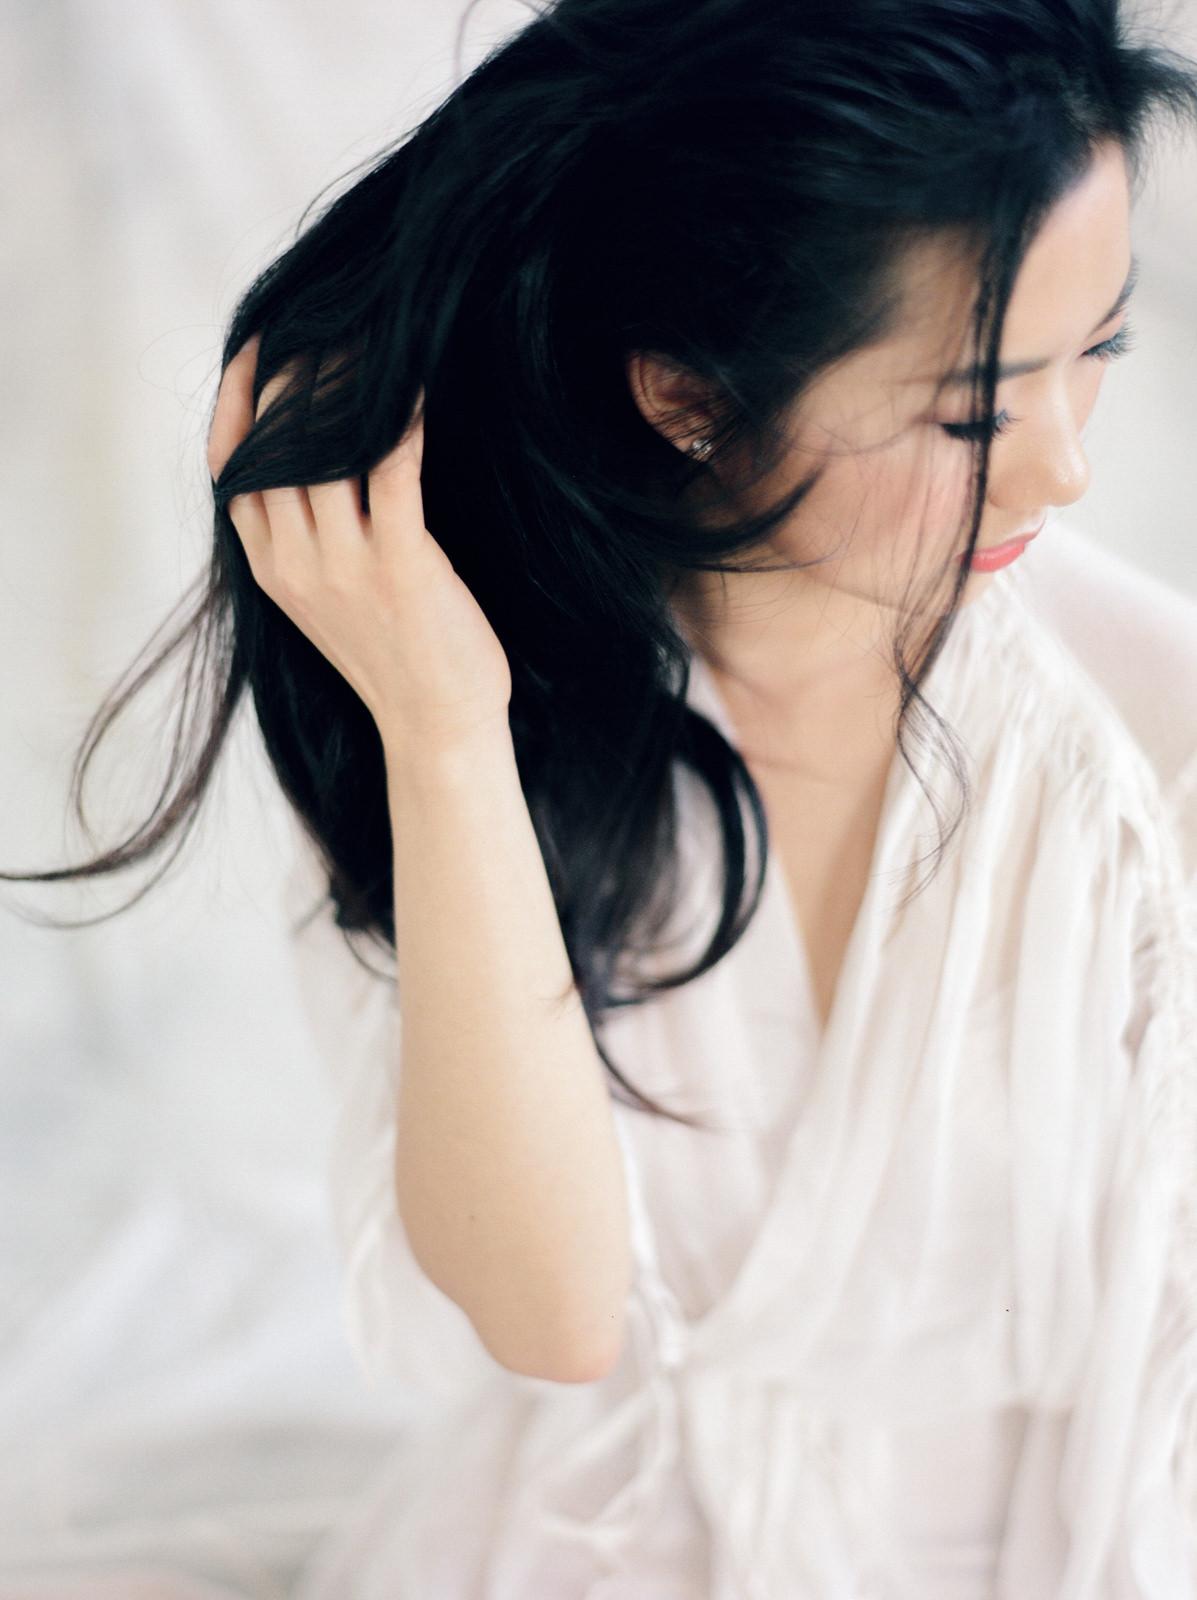 sandra-chau-stylist-fine-art-editorial-shoot-wedding-dress-hair-unearthingtc-1.jpg